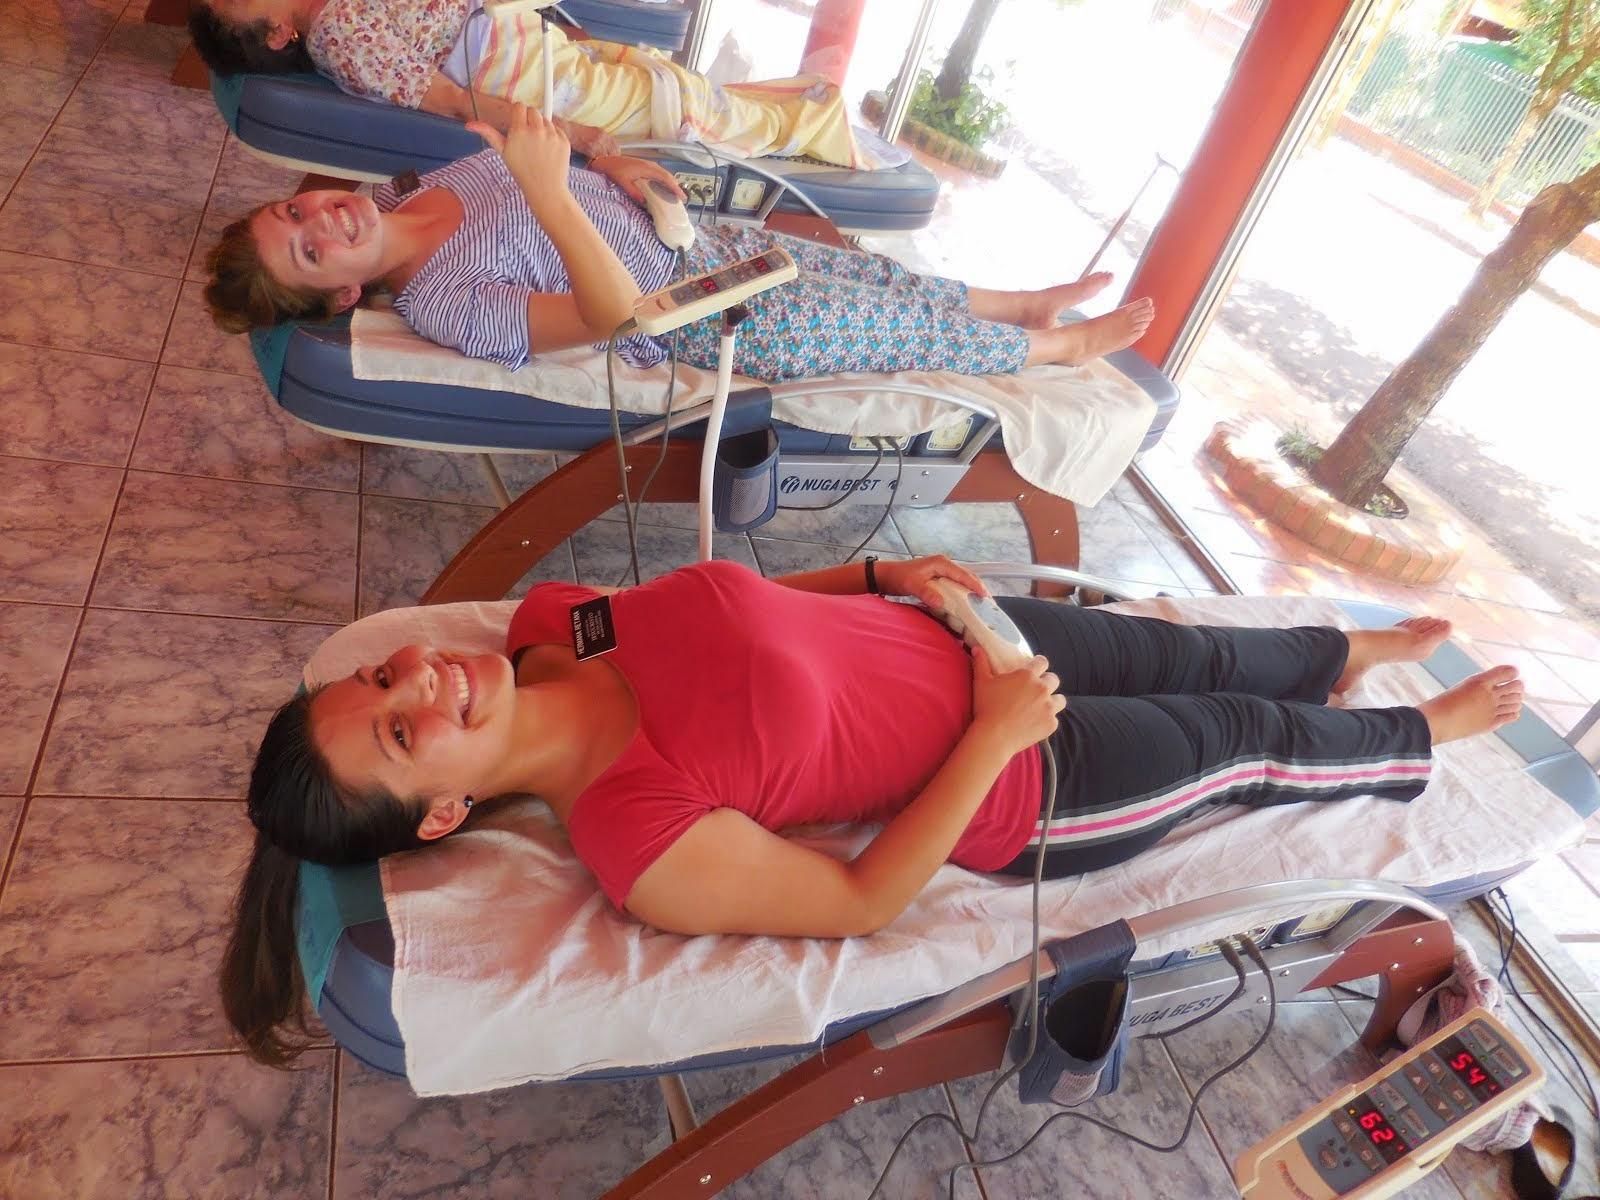 Companion #5 - Puerto Rico, Argentina (Feb 25, 2015 - Mar 16, 2015)